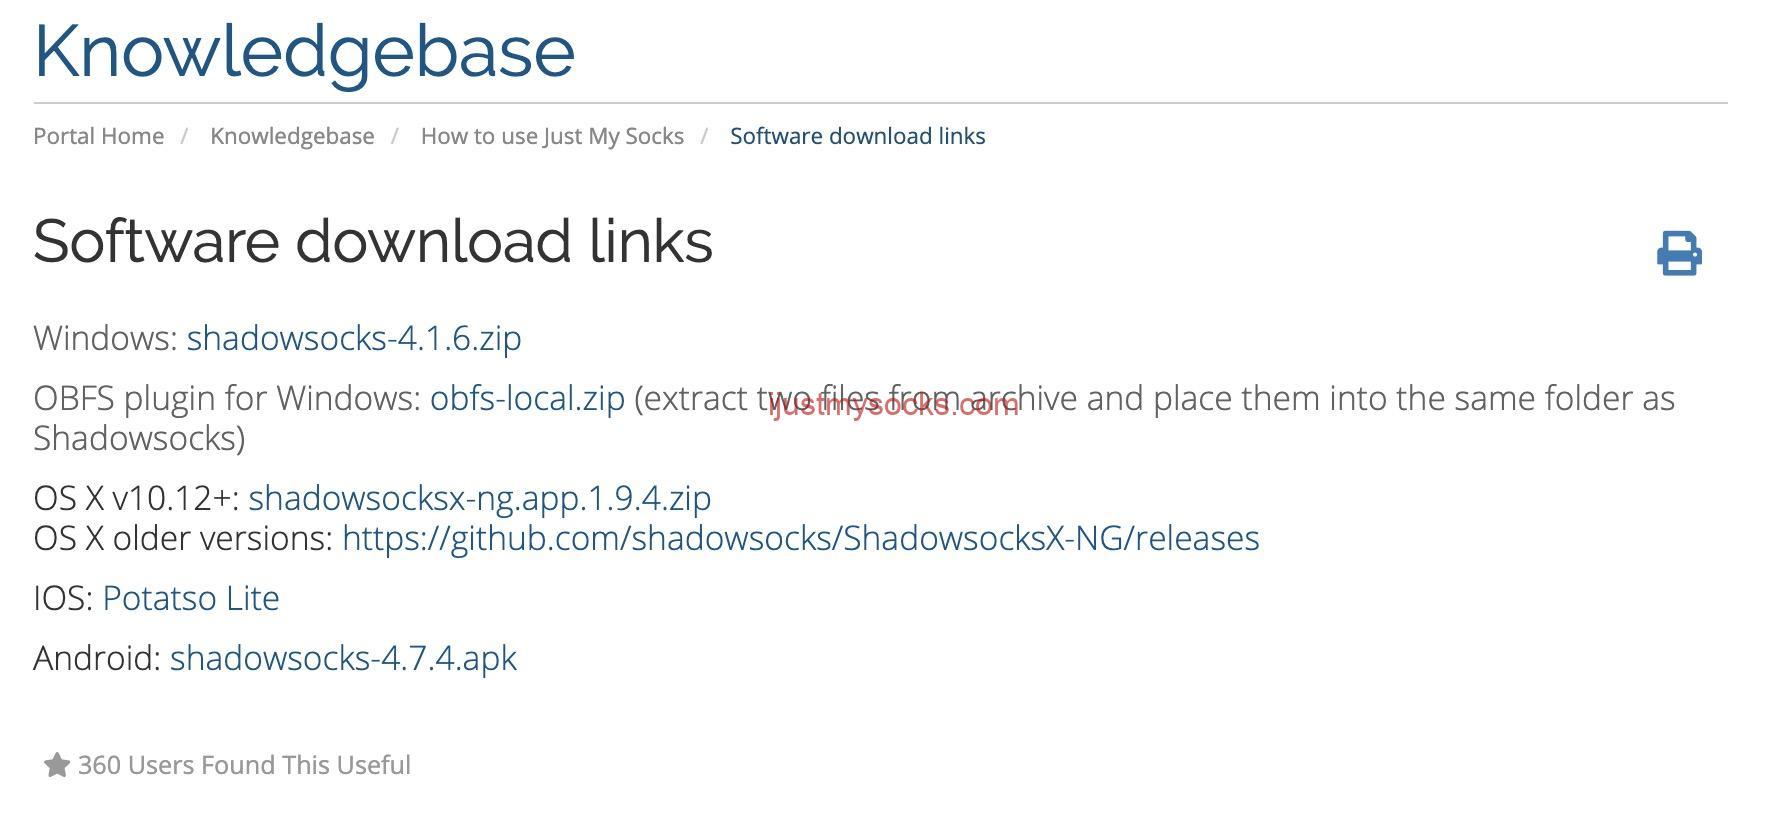 Just My Socks Windows、Mac、iOS 苹果手机、Android 安卓手机客户端下载地址